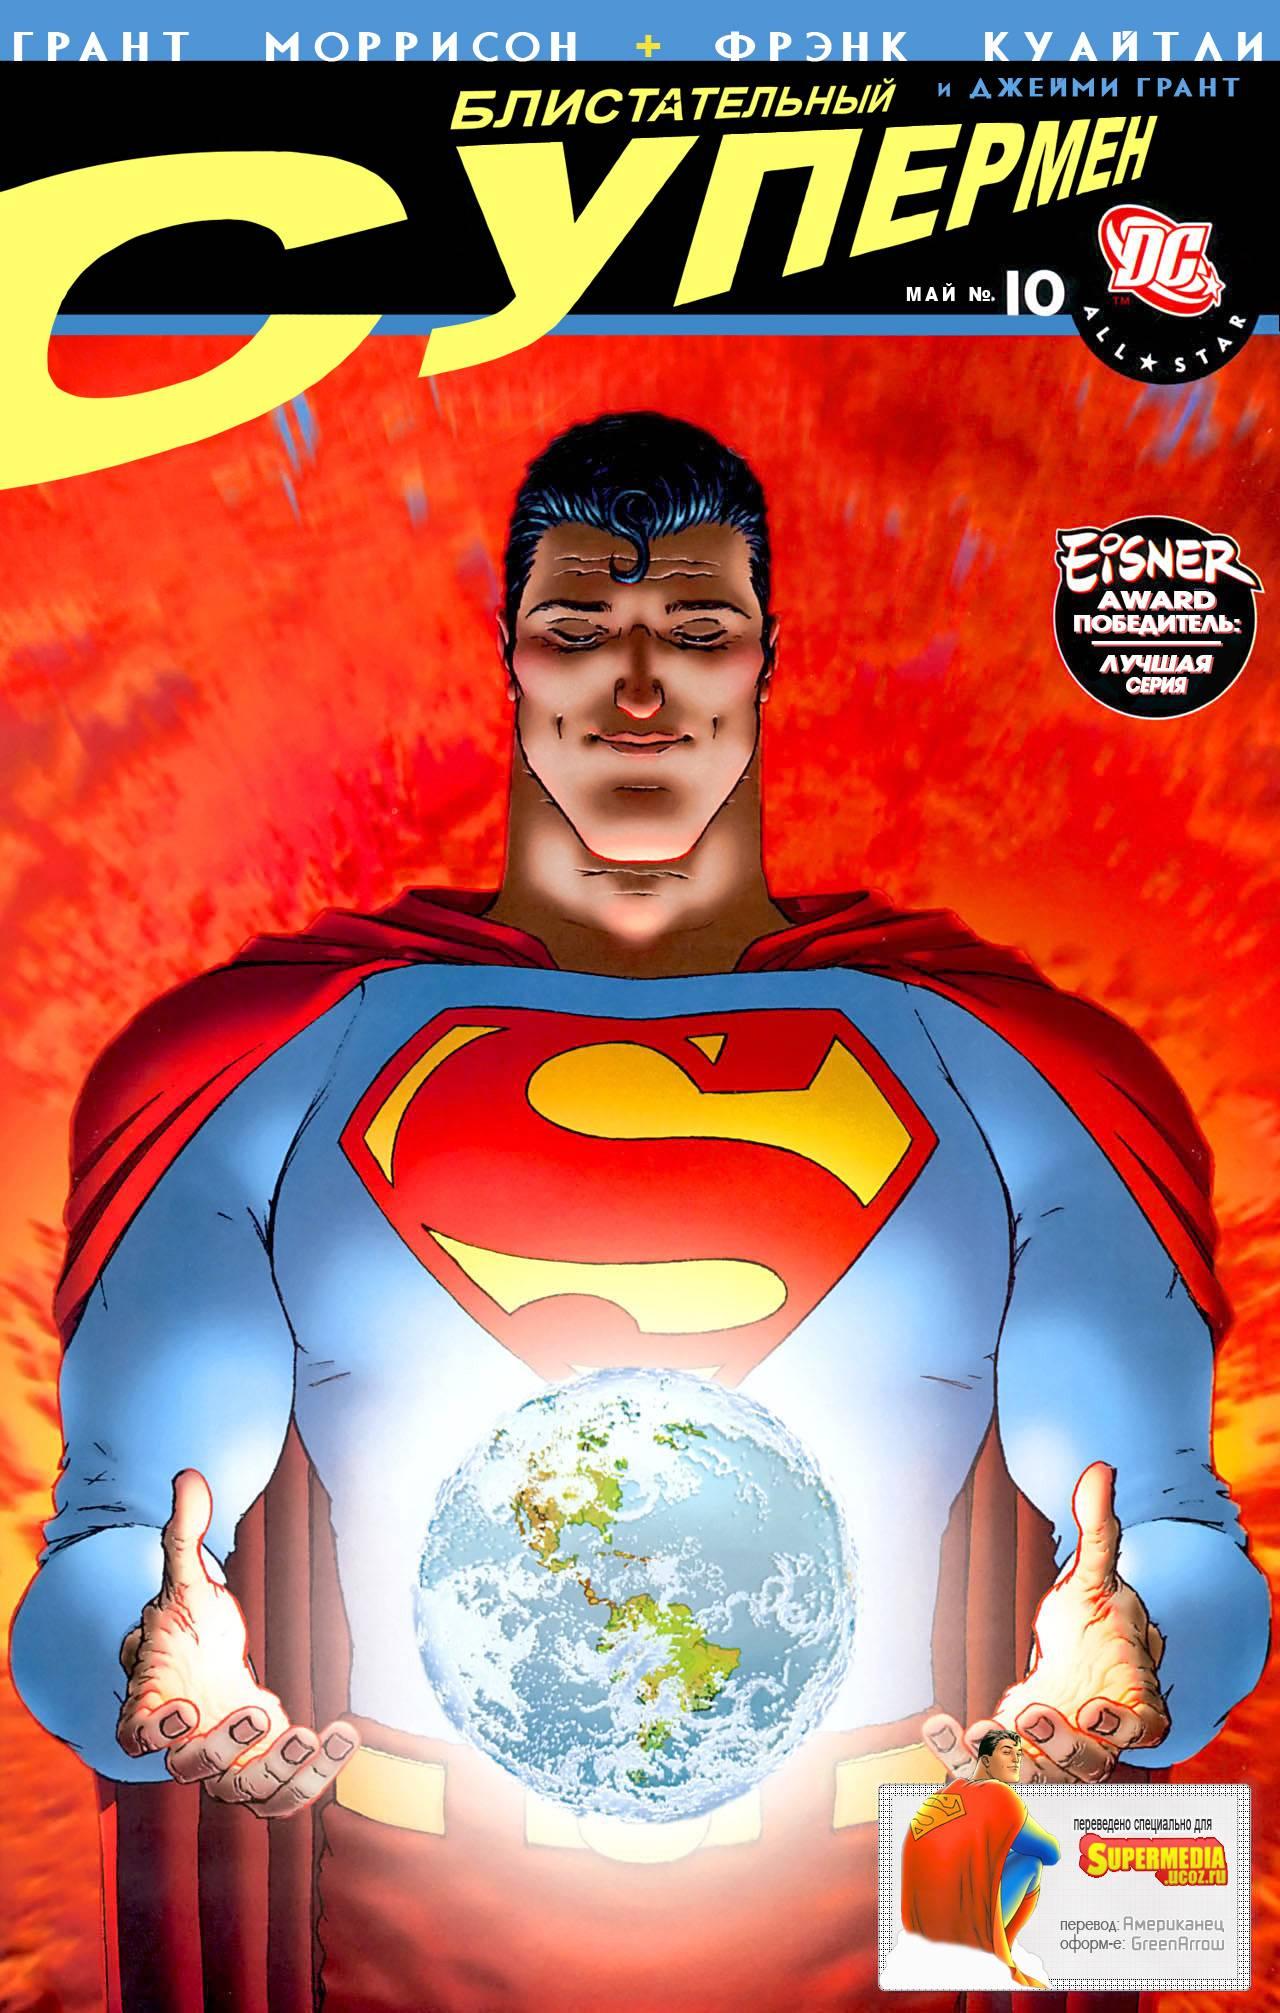 Блистательный Супермен №10 онлайн